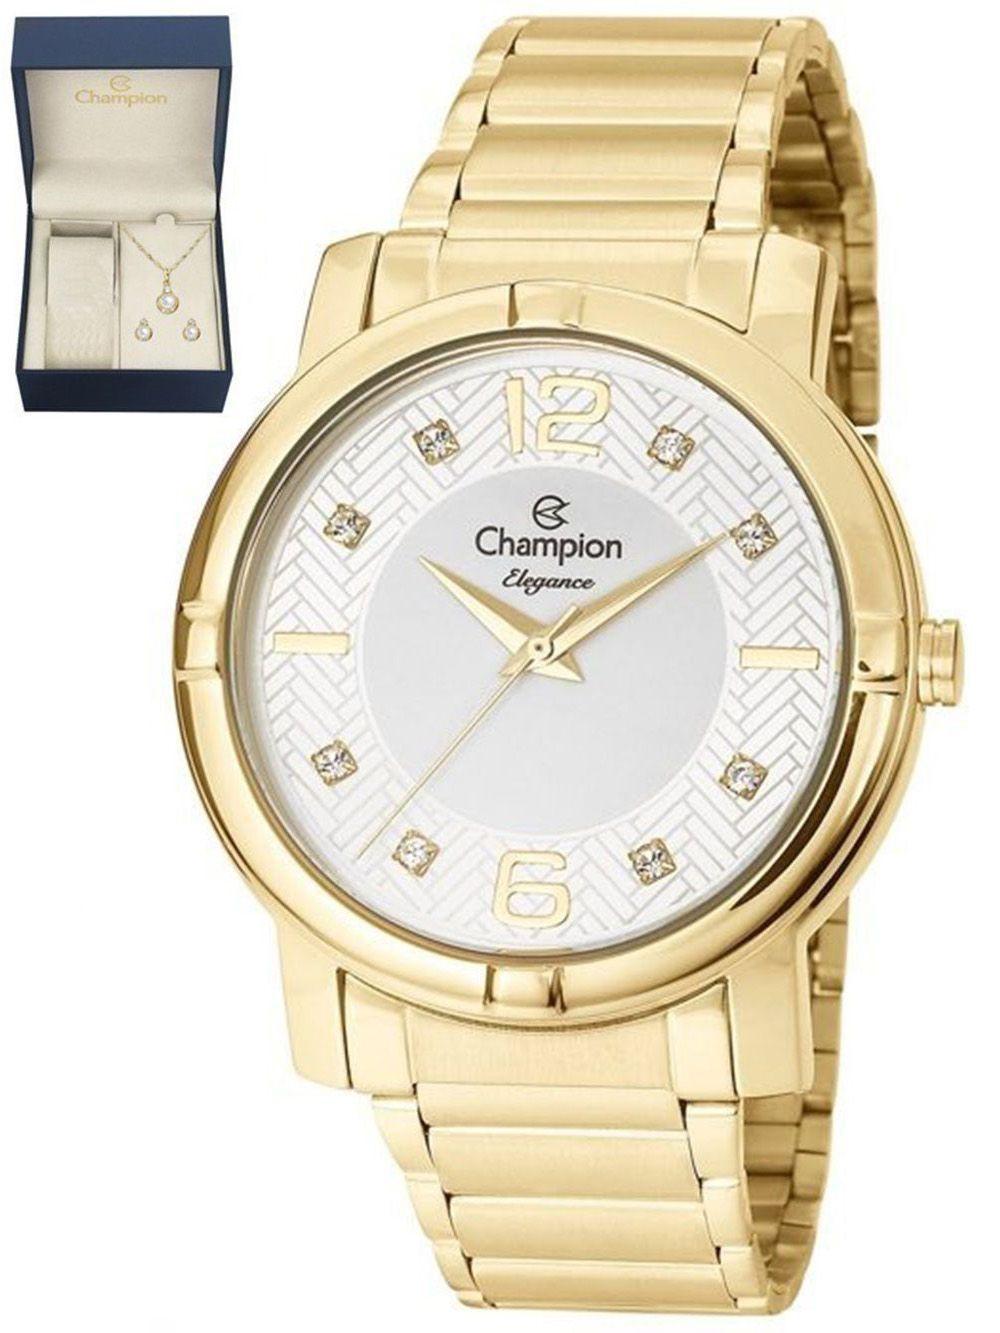 6e325c67ad1 Relógio Champion Dourado Feminino CN25252W + Kit Semijoias - Miranda  Shopping ...